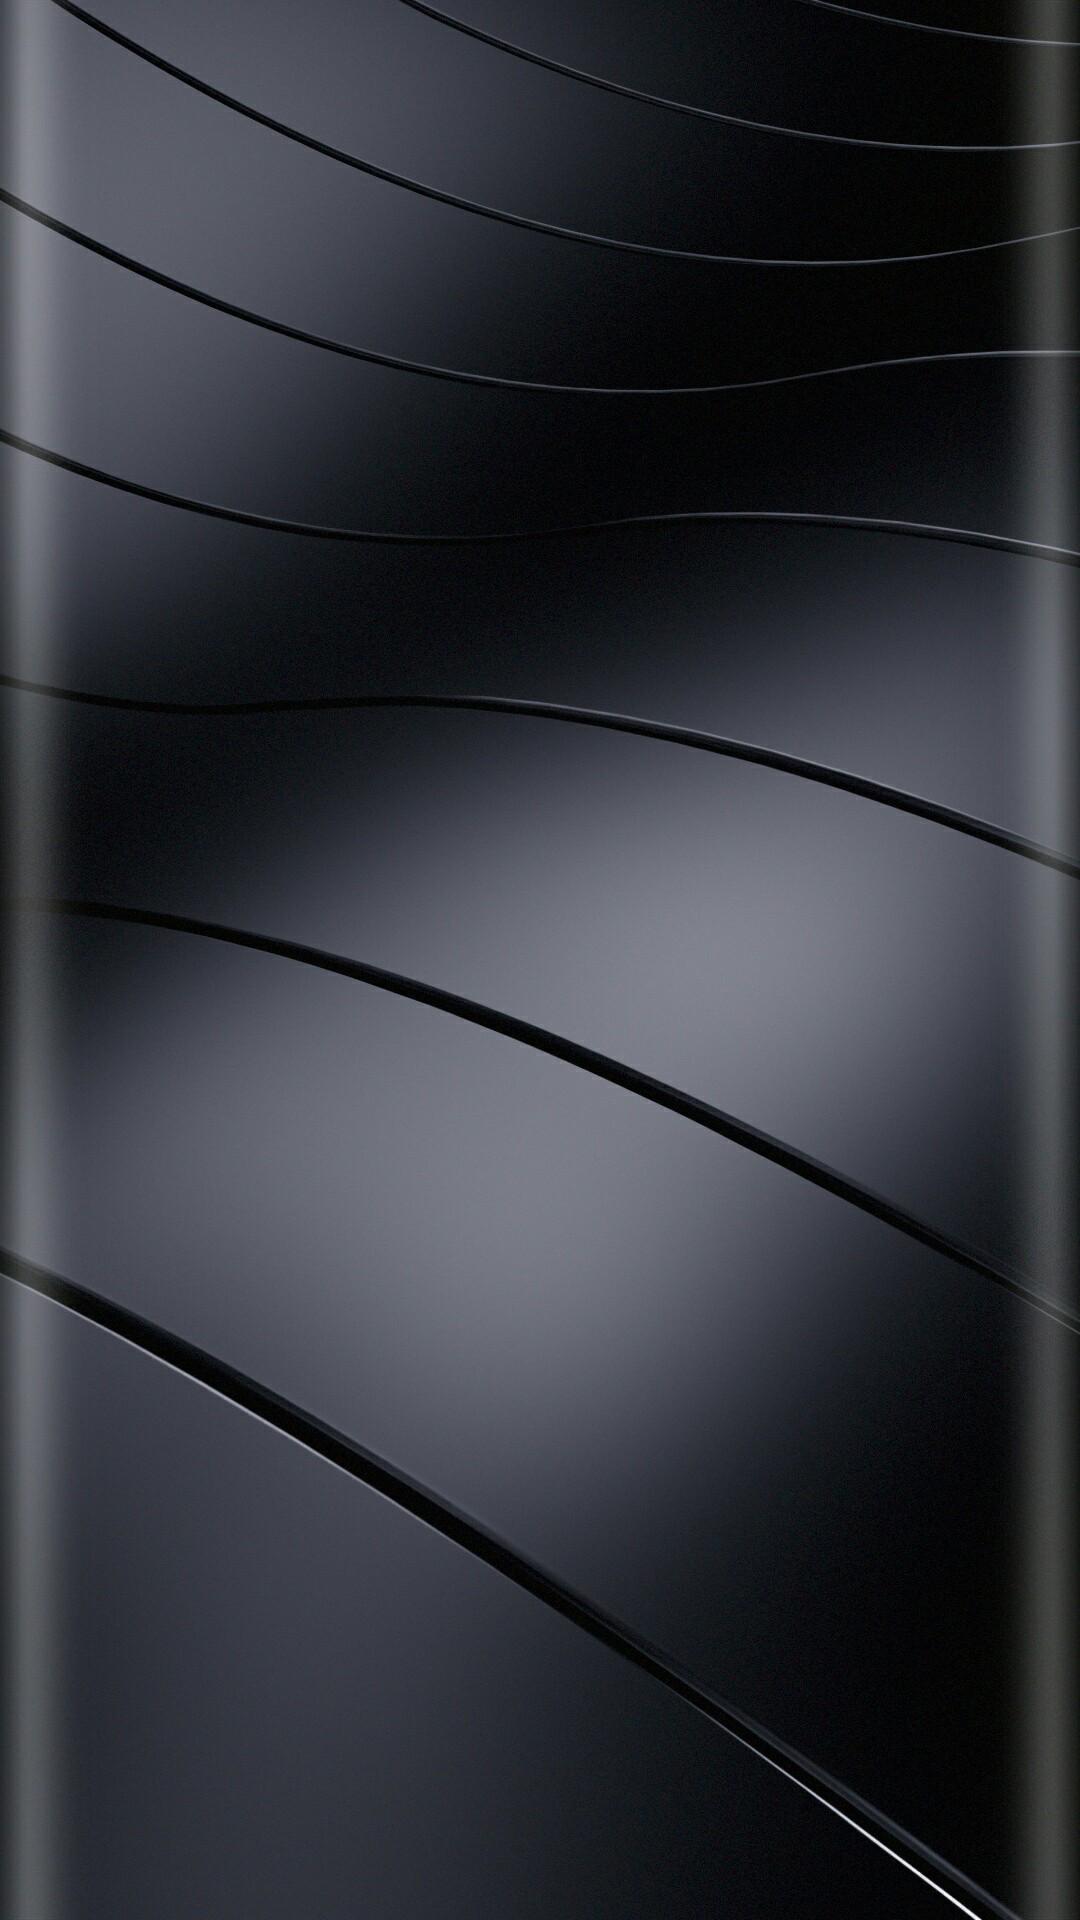 Blue Wavy Curves Wallpaper